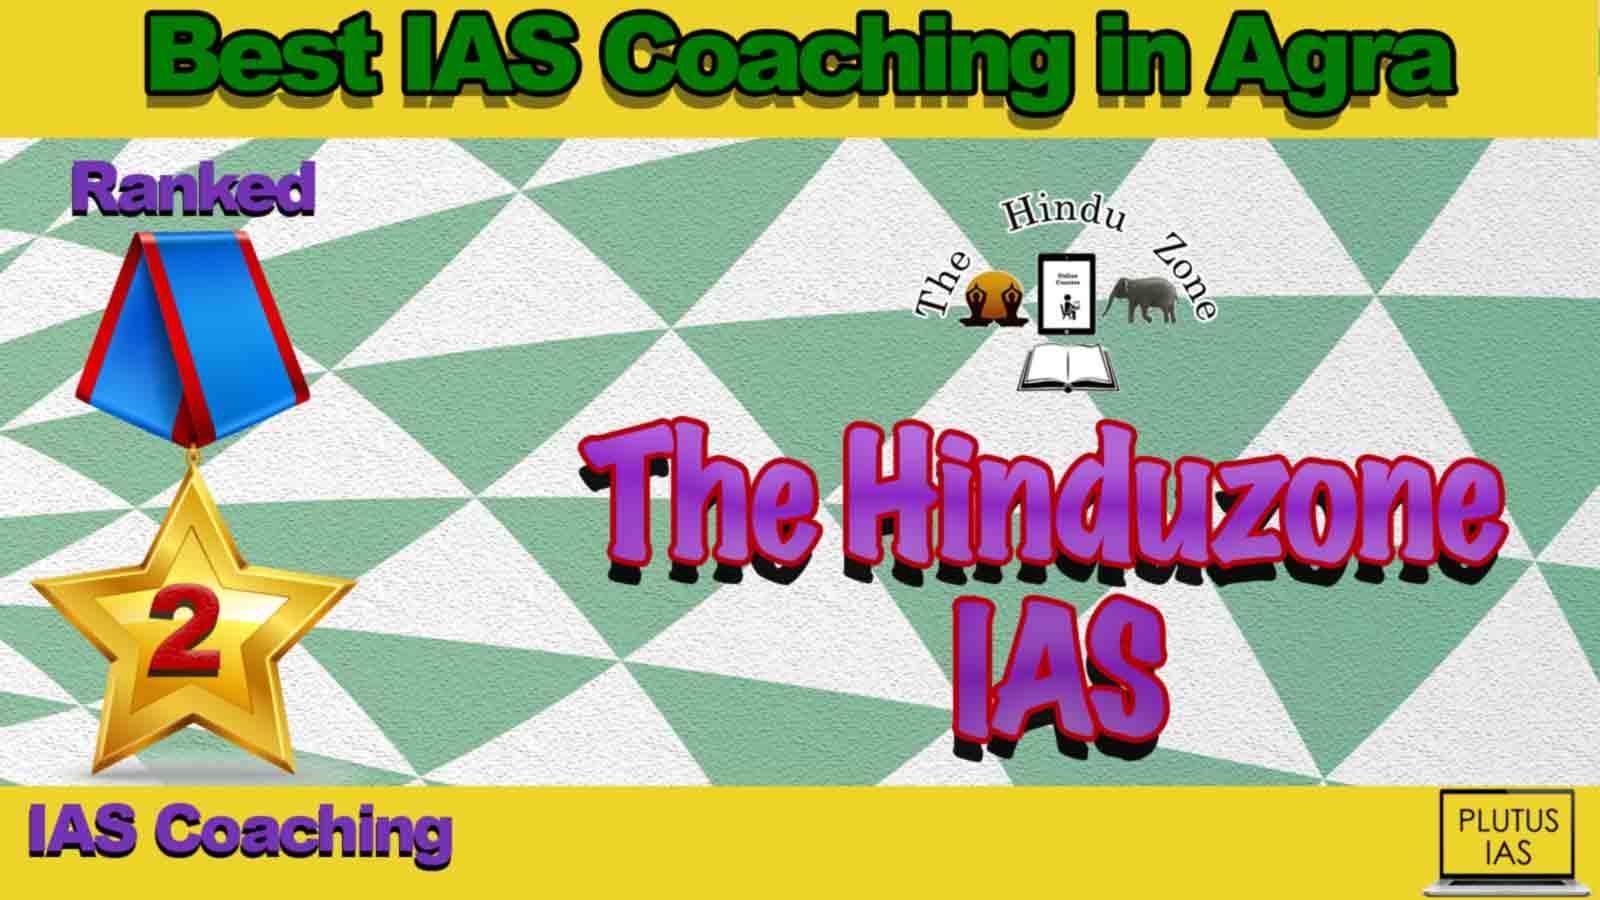 Top IAS Coaching in Agra